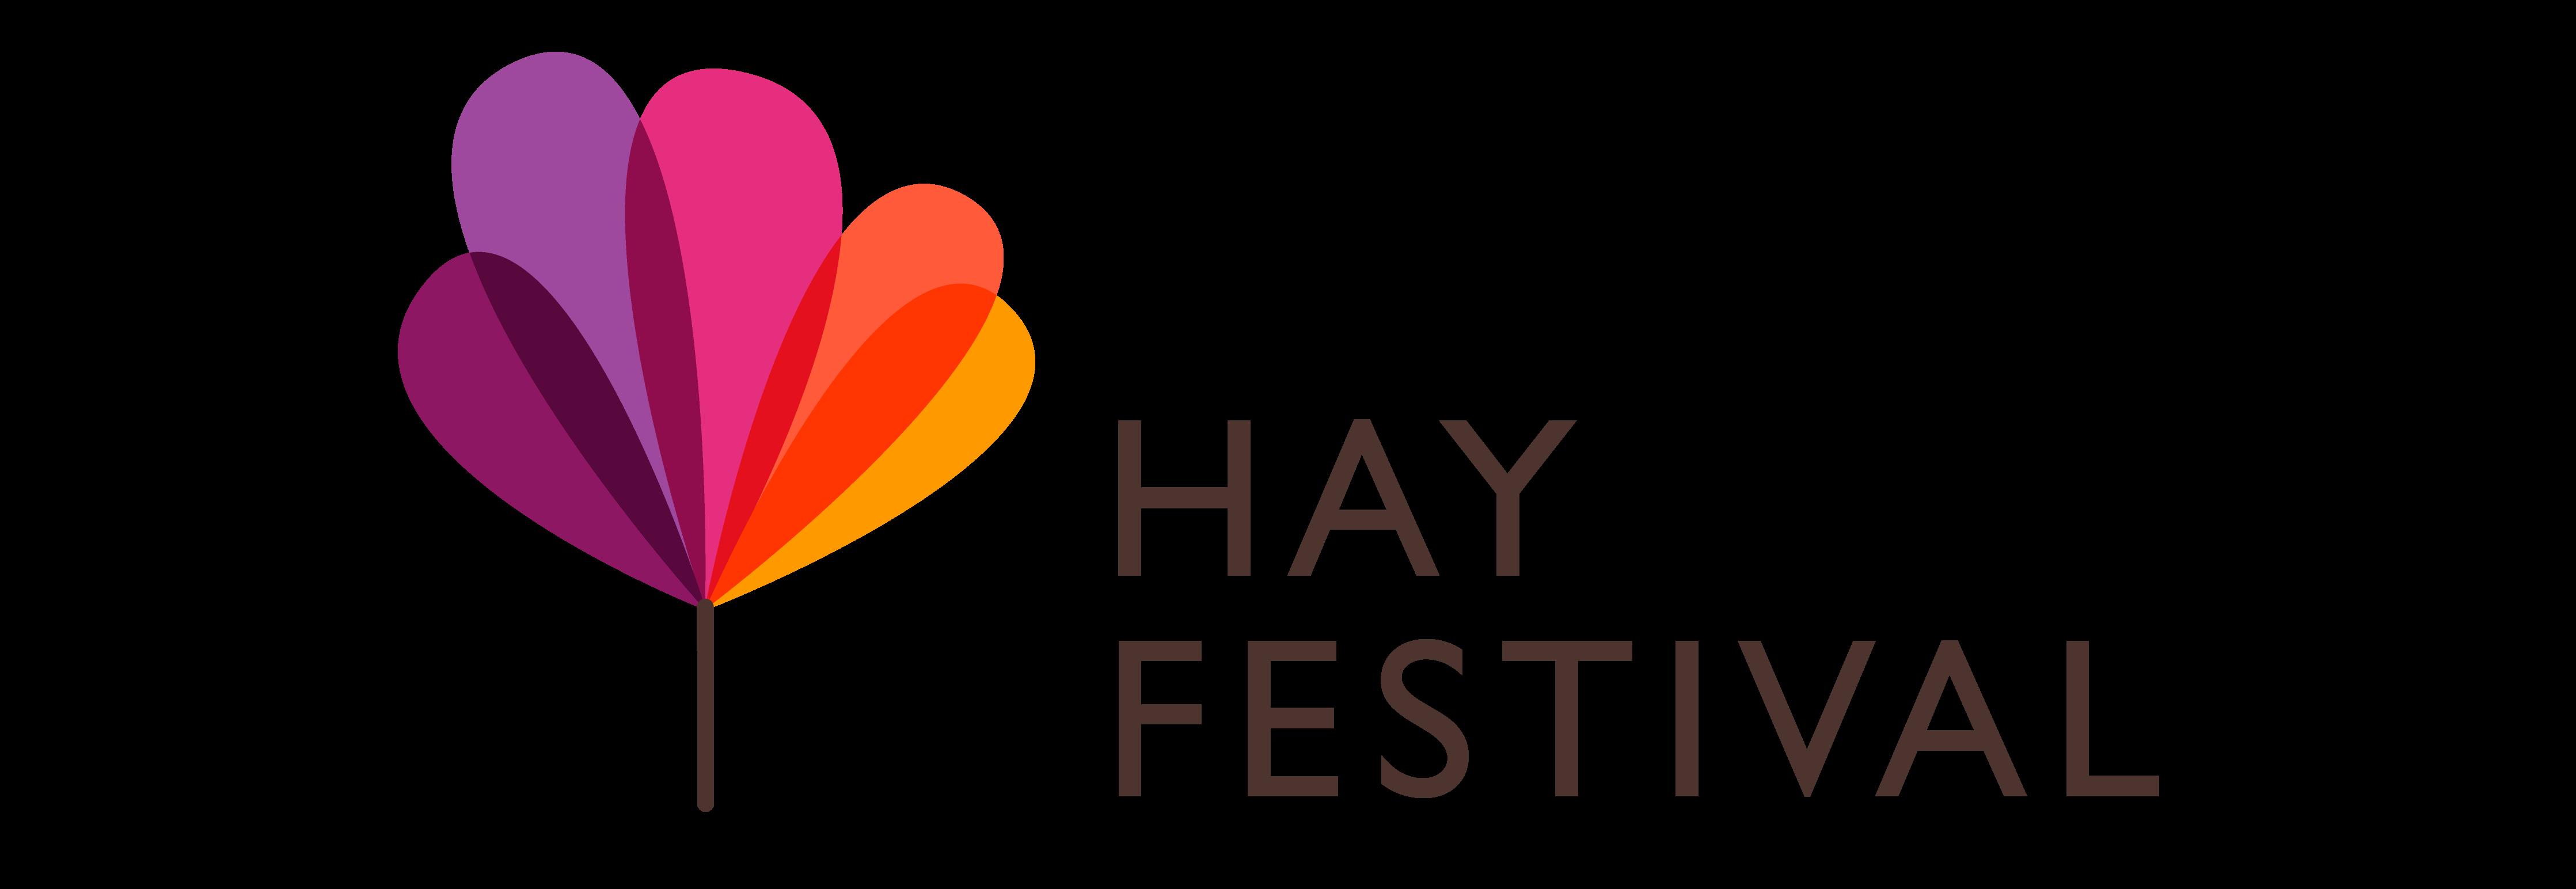 HAY festival logo